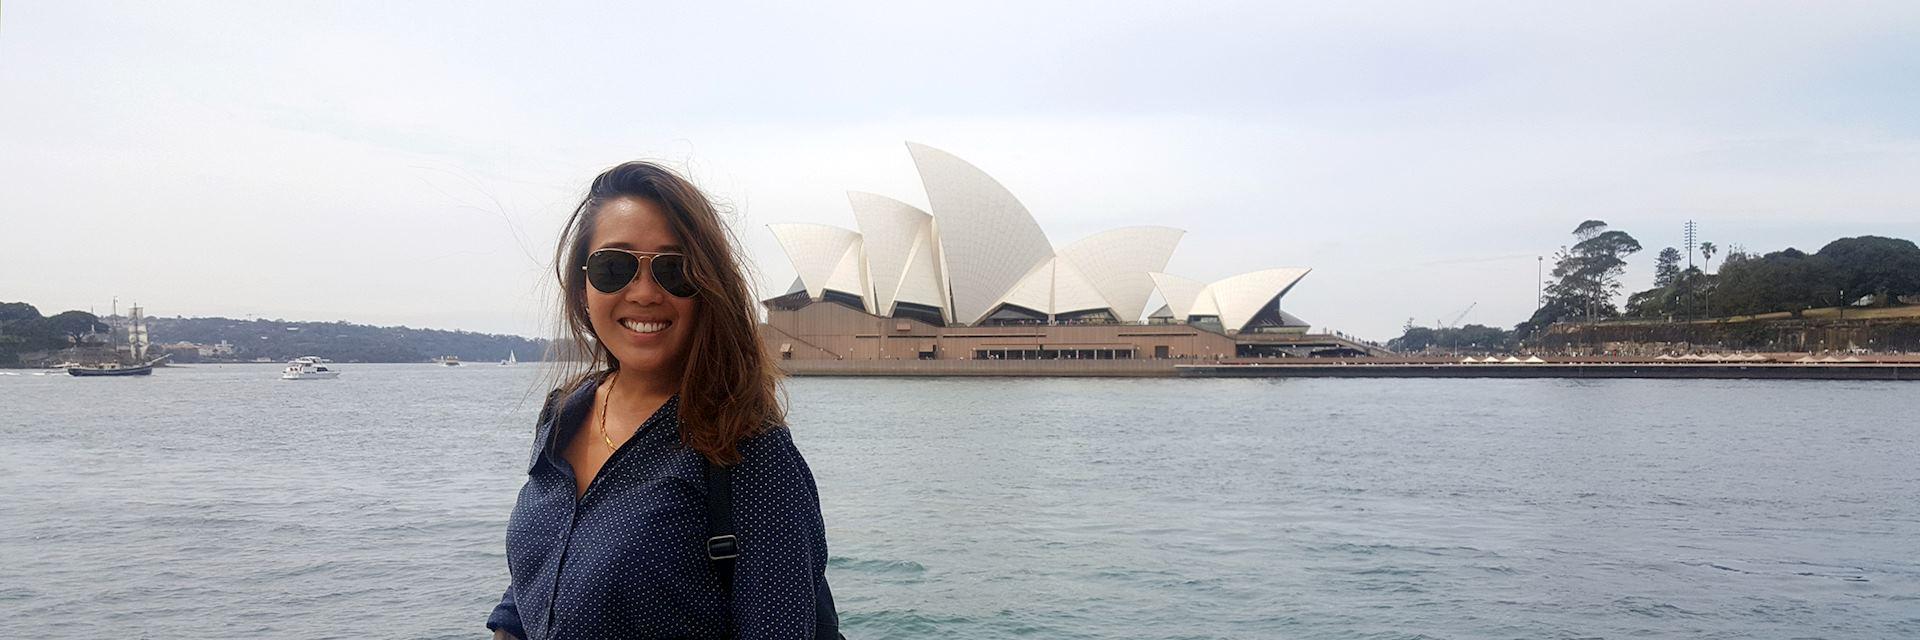 Vina in Sydney, Australia